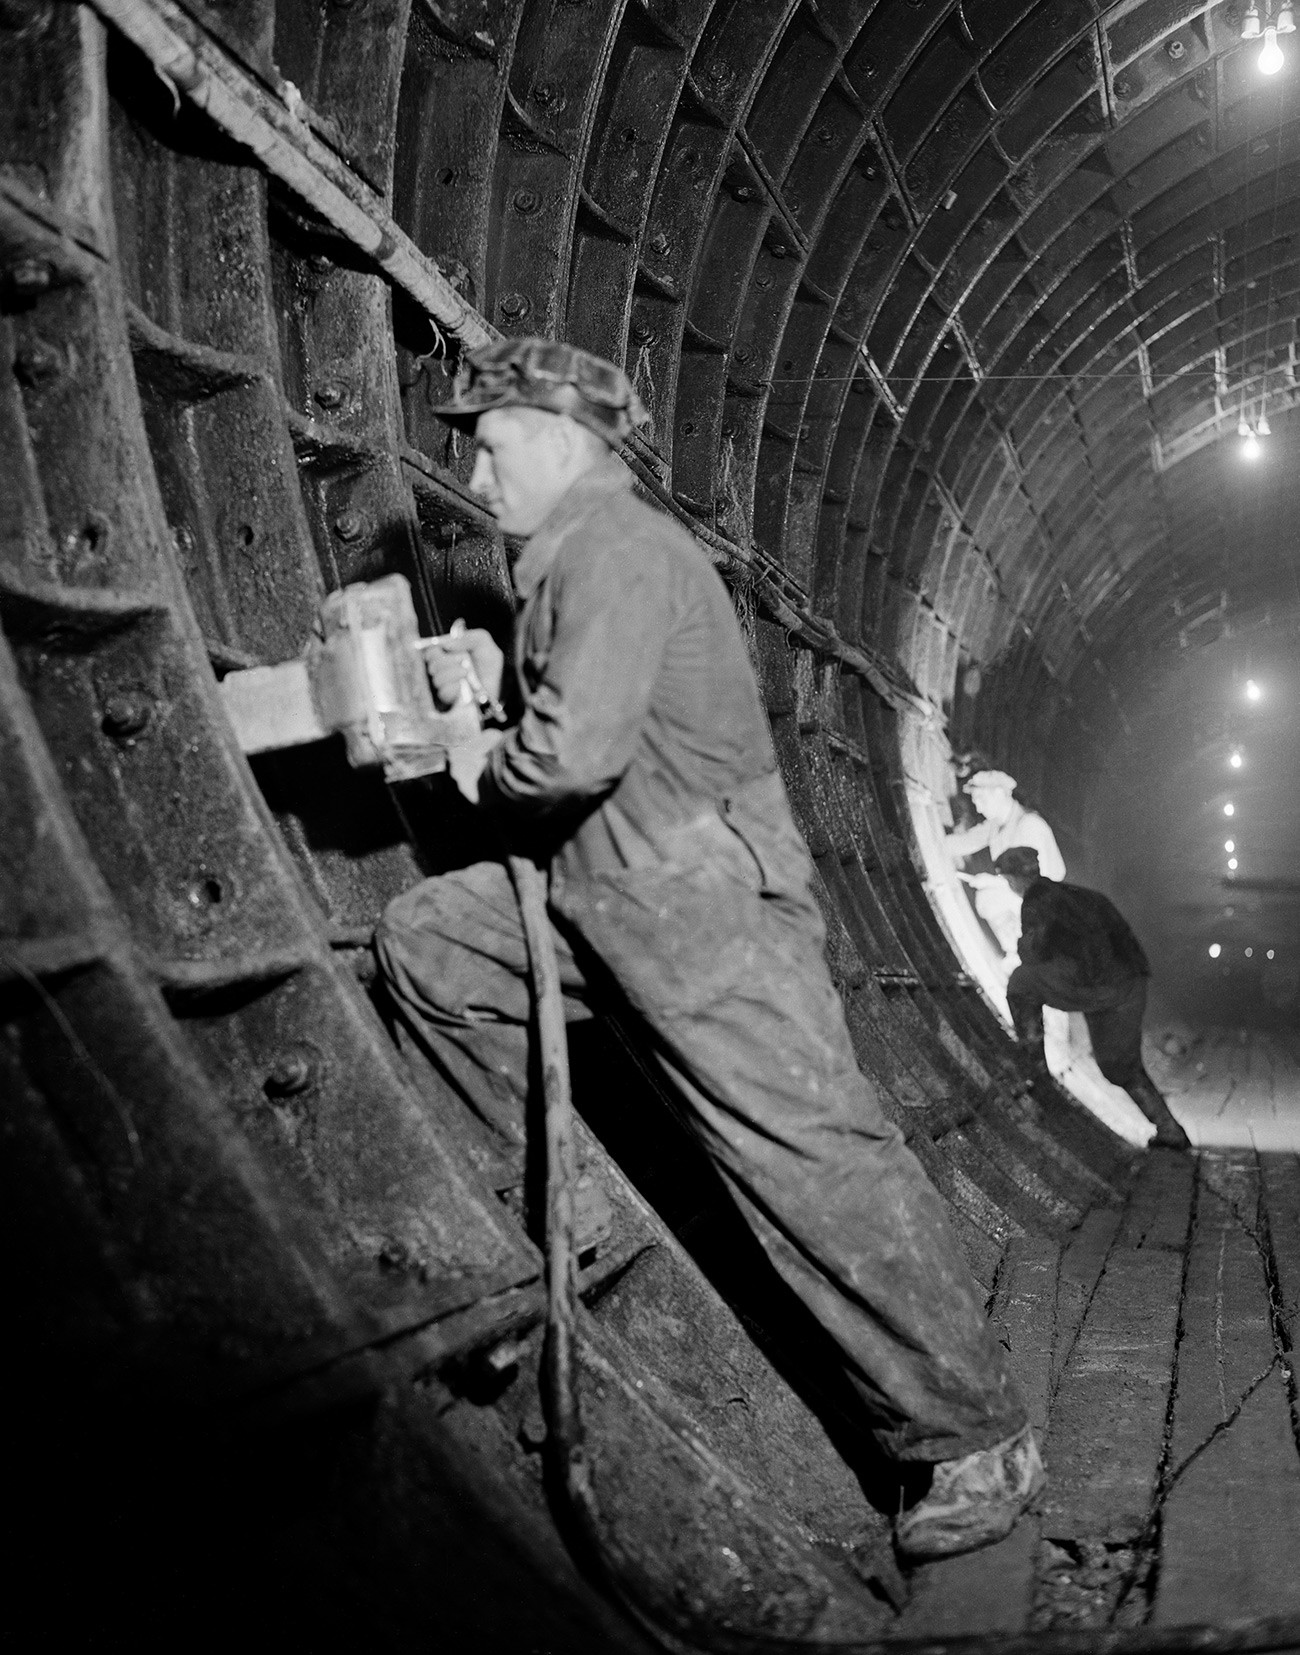 Bau der Arbatsko-Pokrowskaja U-Bahn-Linie, 1944